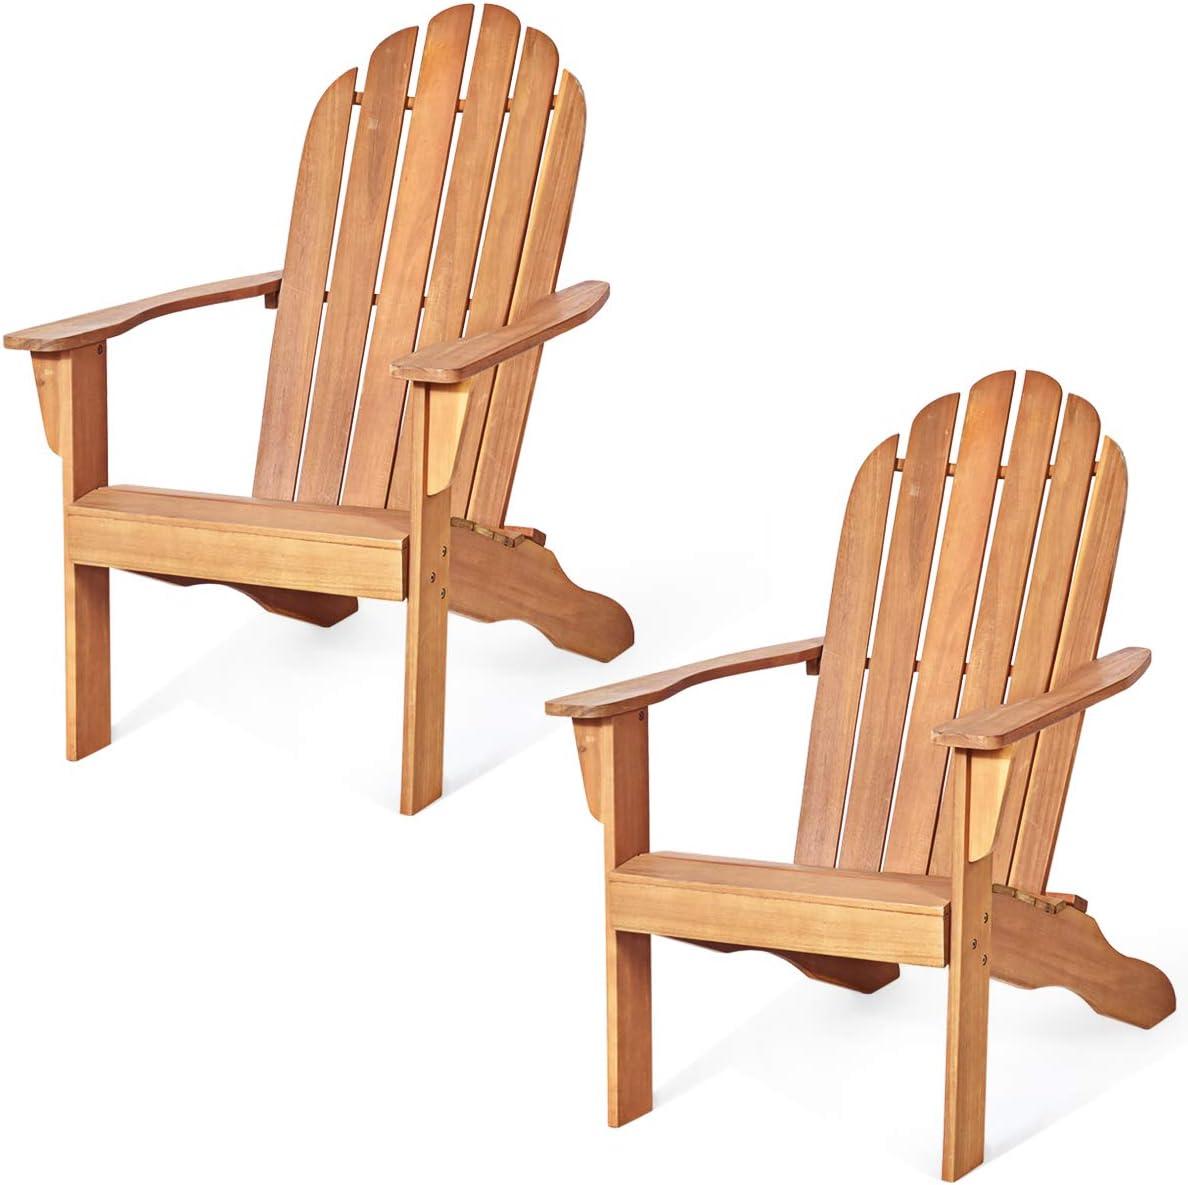 Giantex Adirondack Chair Outdoor Wooden W Ergonomic Design Acacia Chair for Yard, Patio, Garden, Poolside and Balcony Adirondack Deck Lounge Chair Armchair 2, Natural